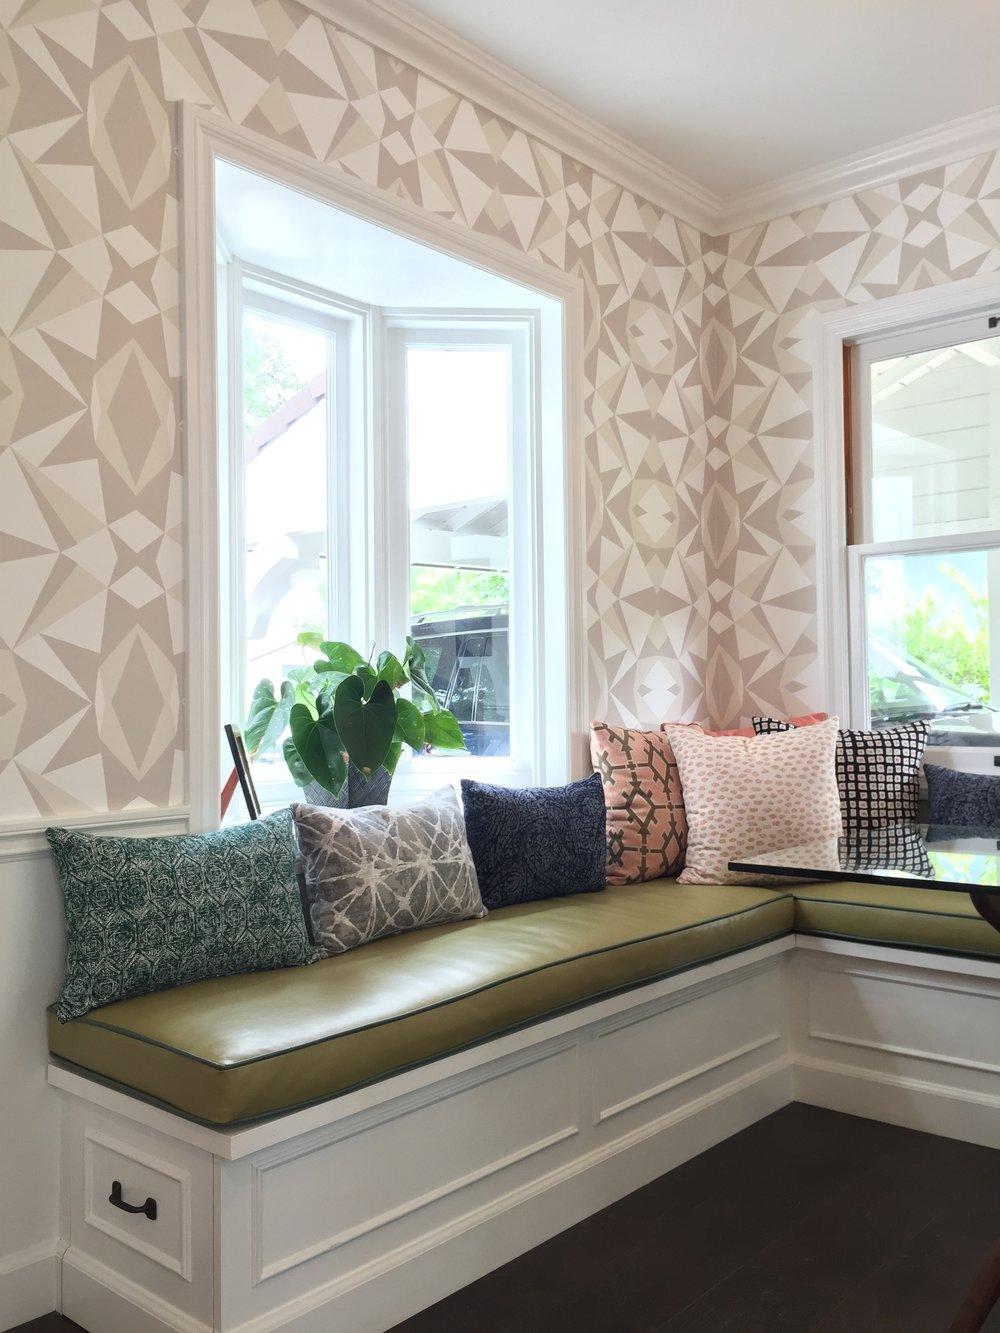 MOSAIC PRINT IN NEUTRAL Designer: Stone Textile